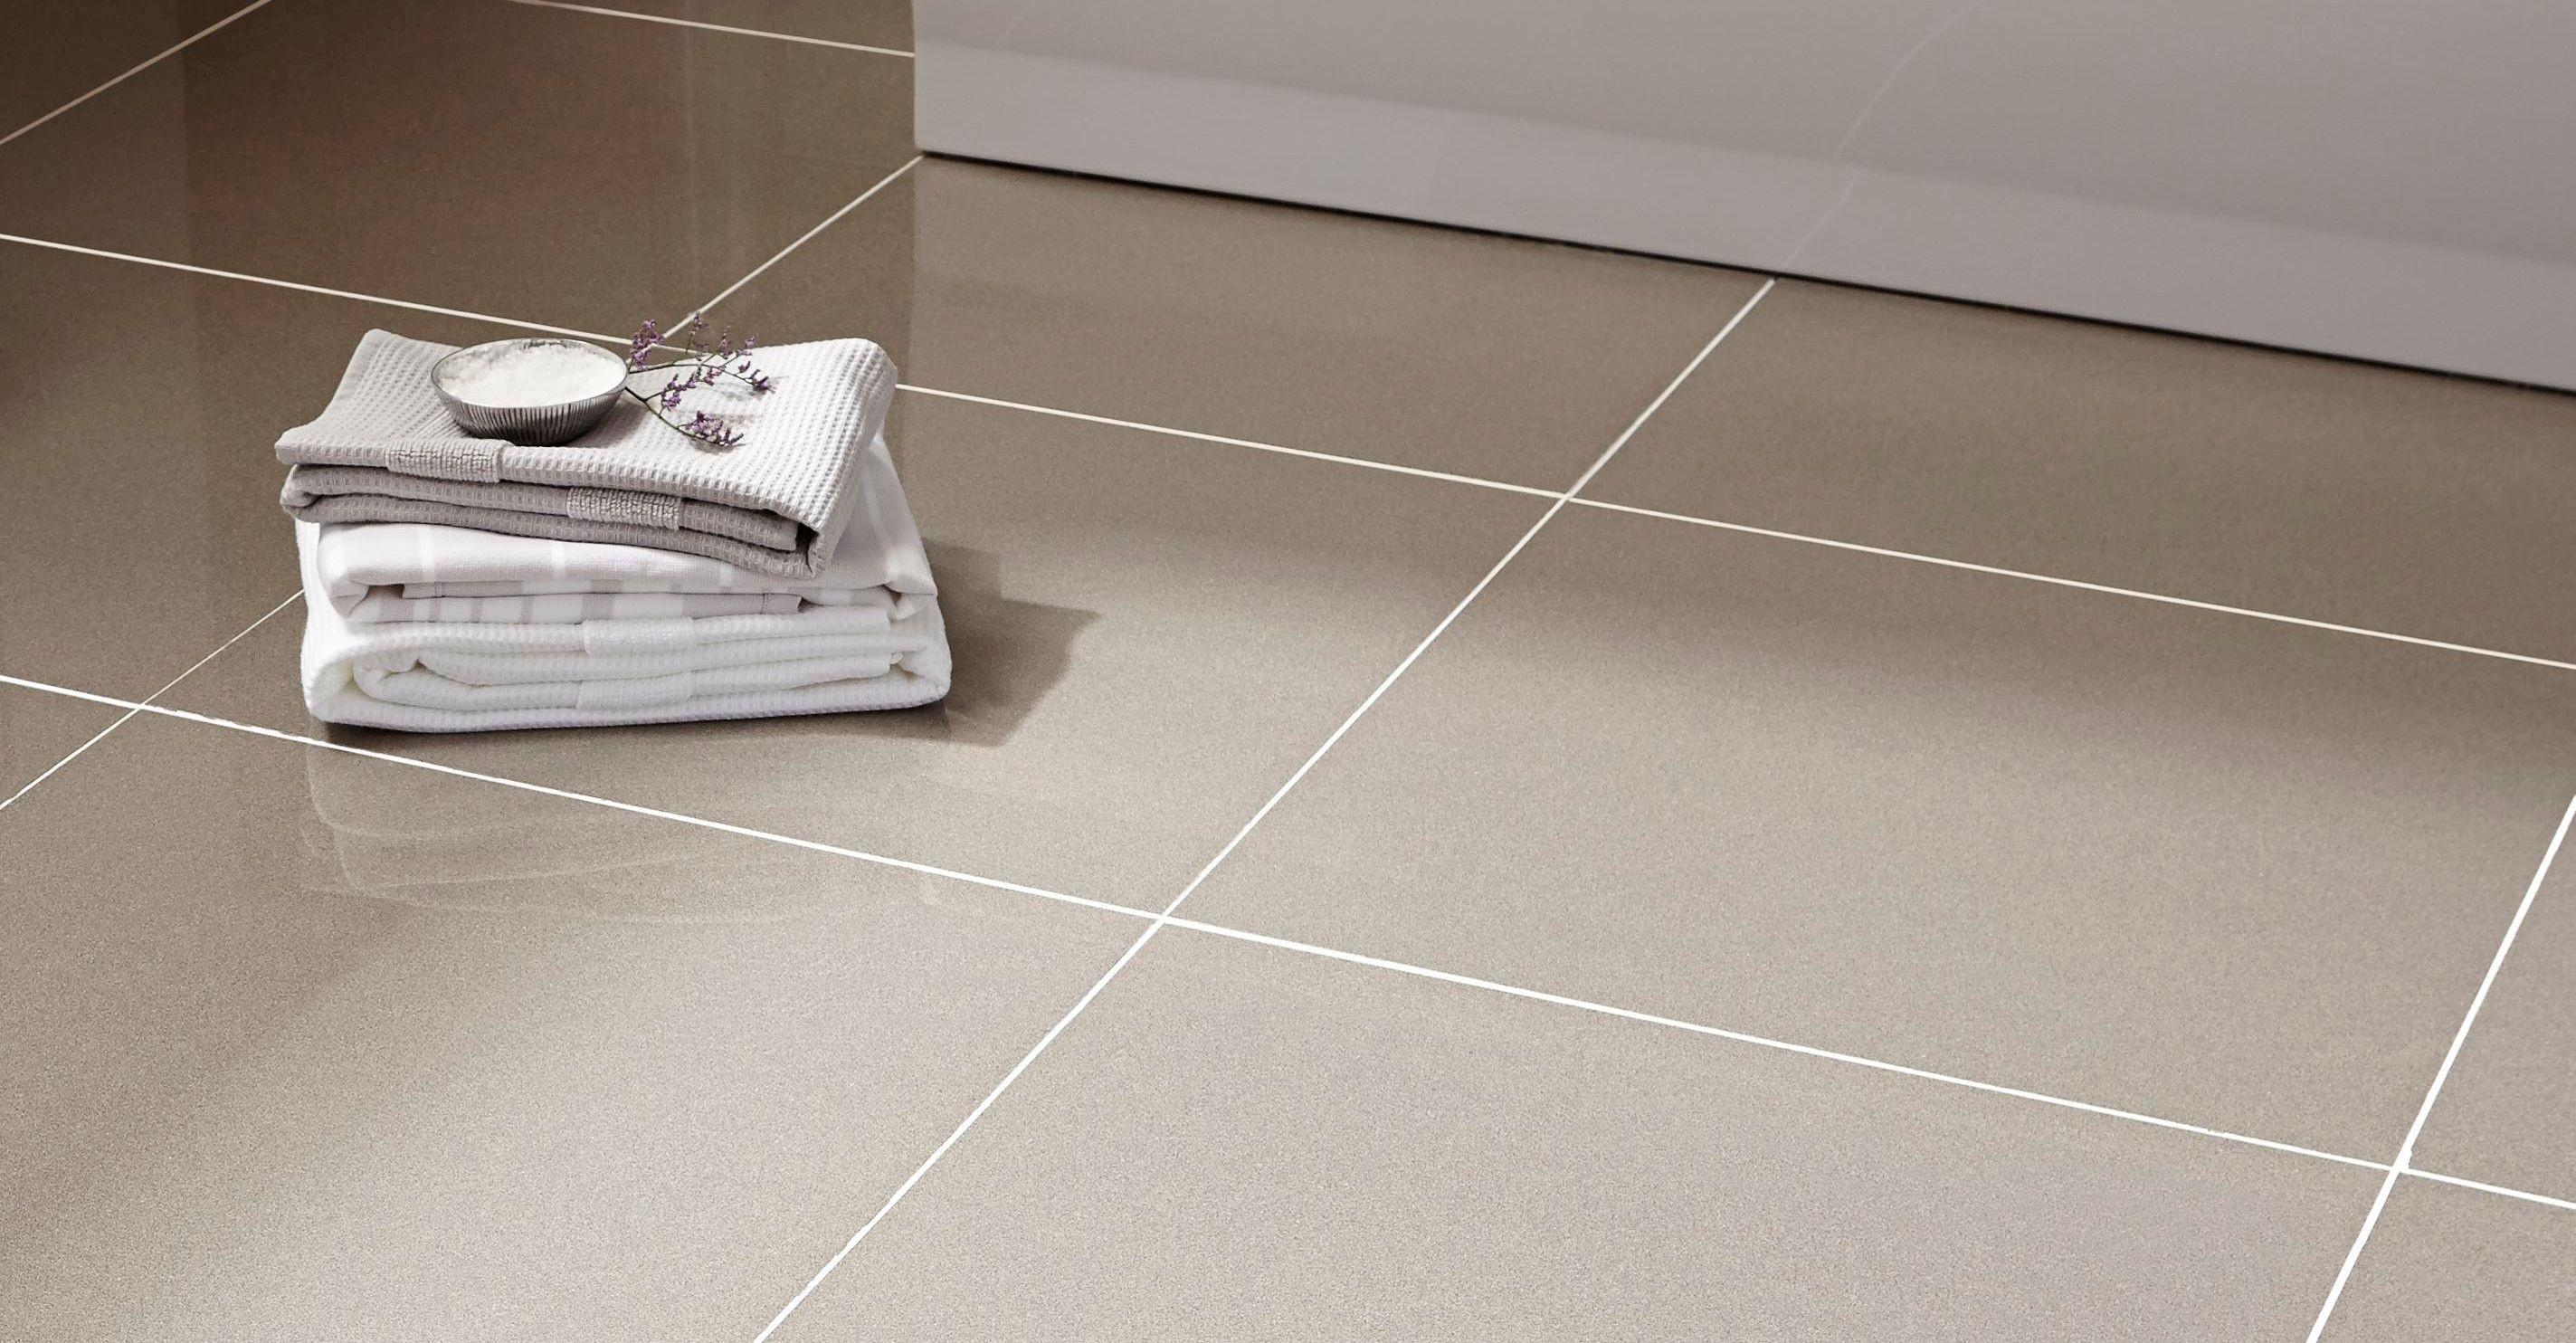 Tile Flooring for Bathroom Elegant How to Lay Floor Tiles Ideas Advice Pattern